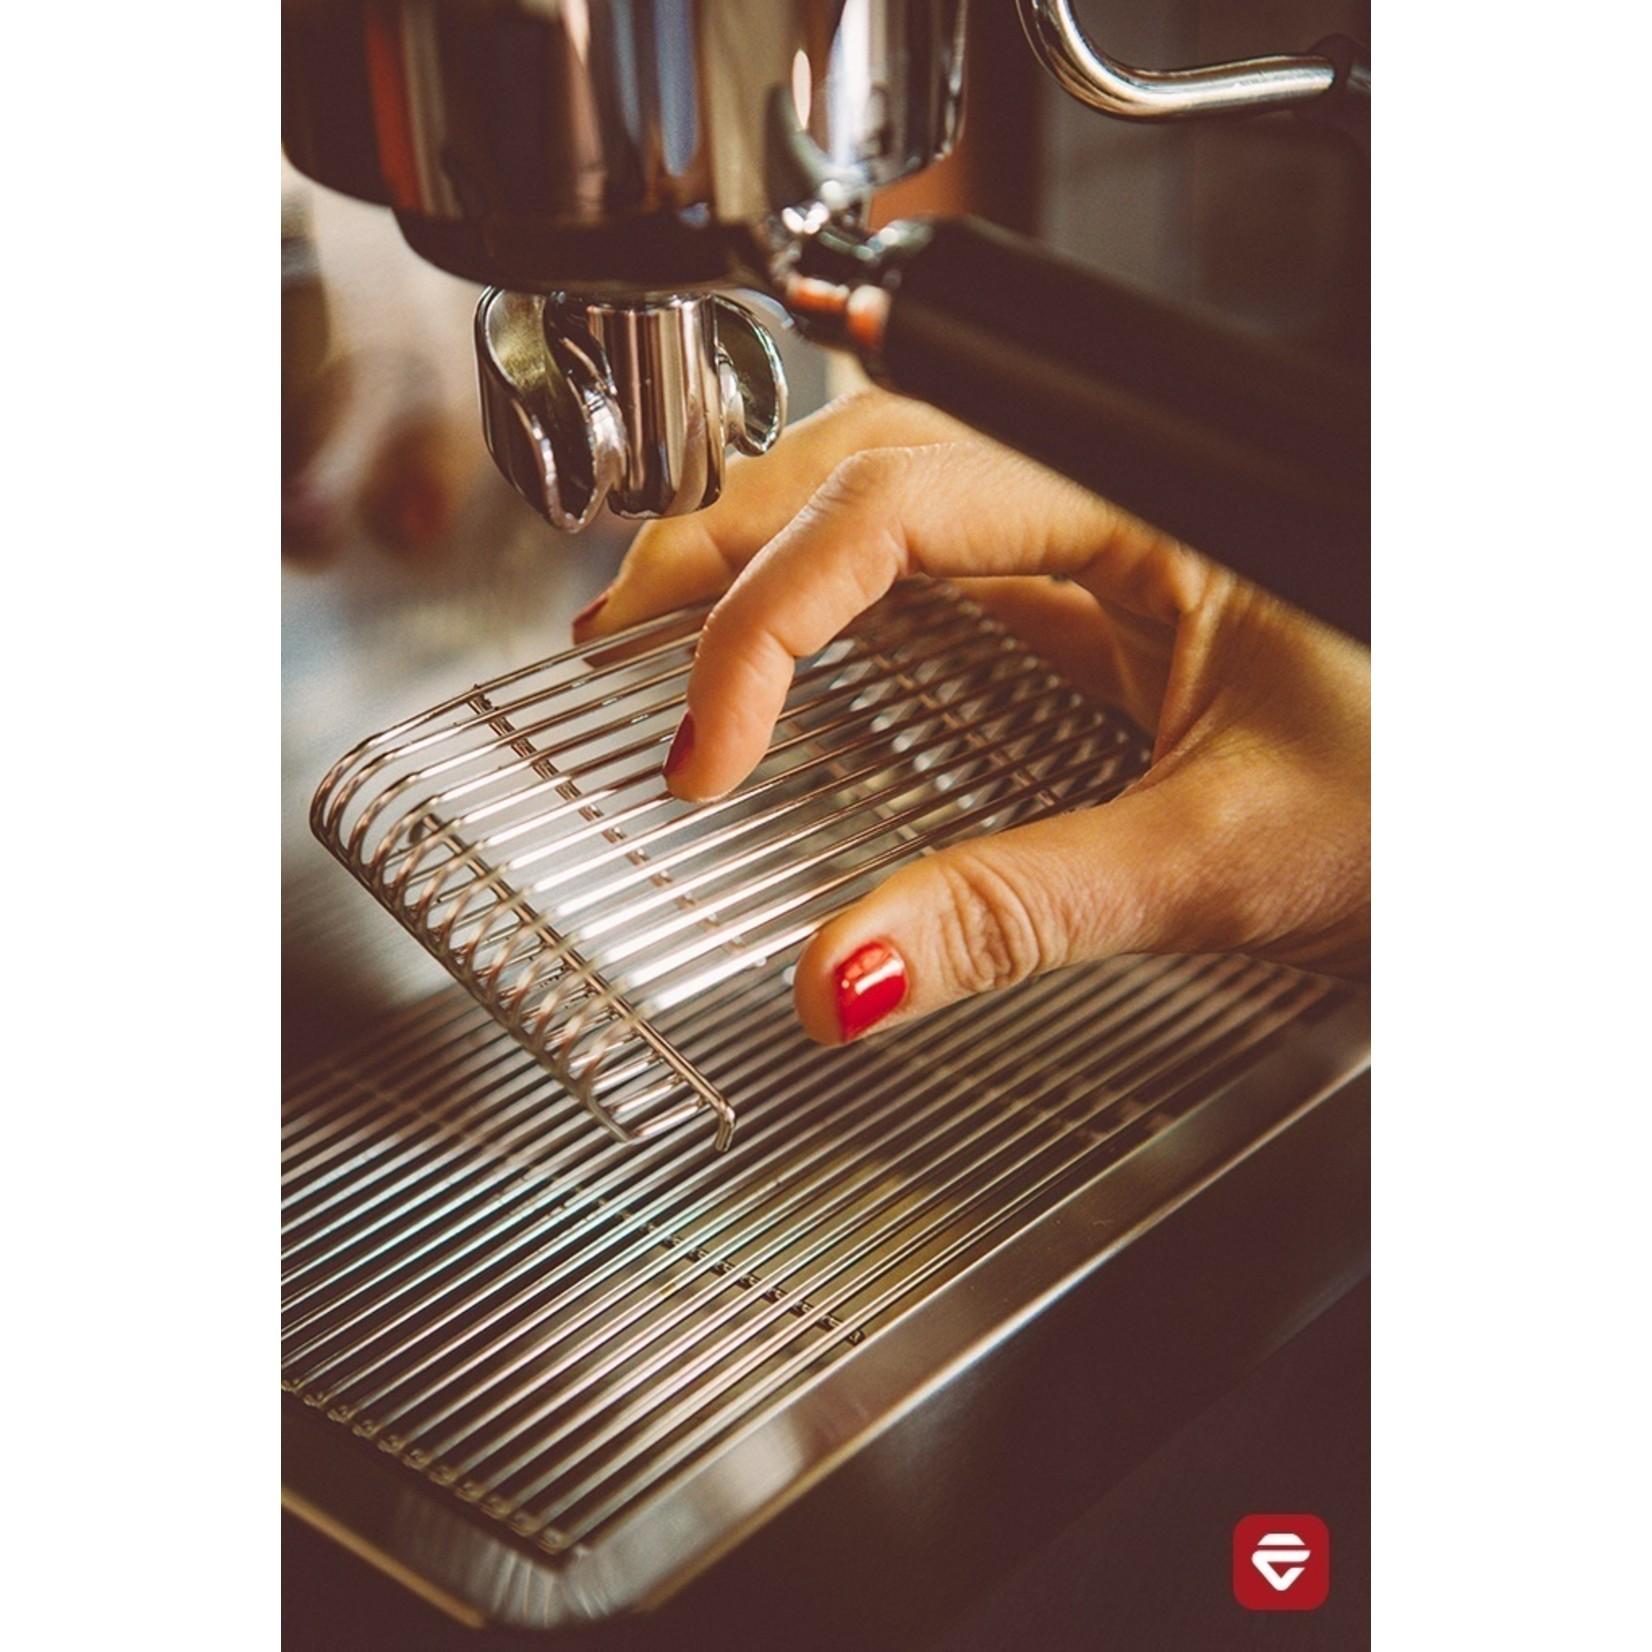 Lelit Lelit espressomachine PL81T Grace